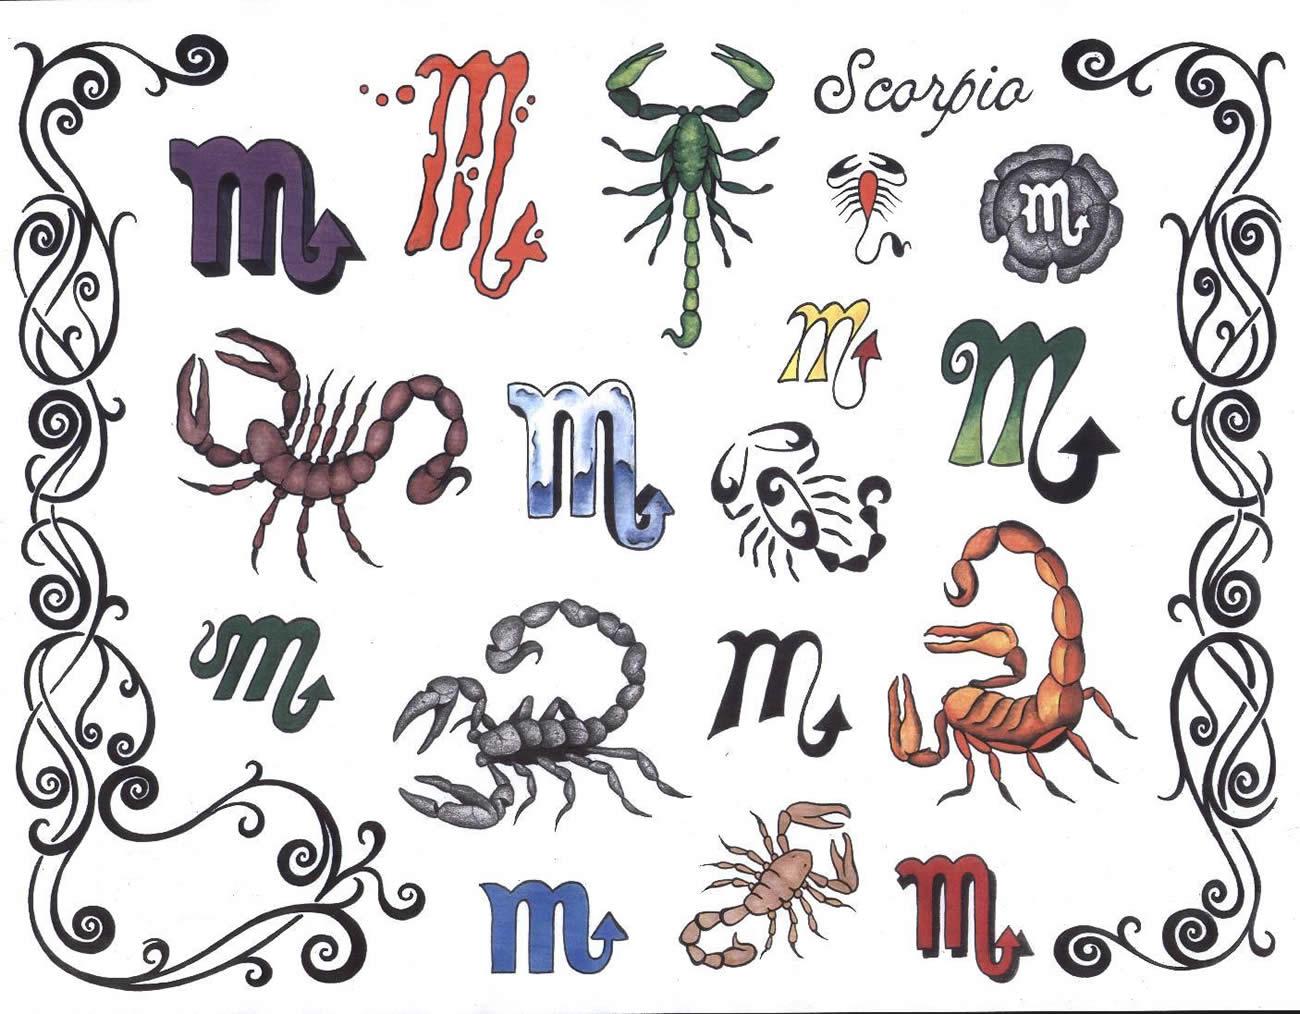 Татуировки скорпиона (знак зодиака СКОРПИОН) - флеш эскизы, картинки